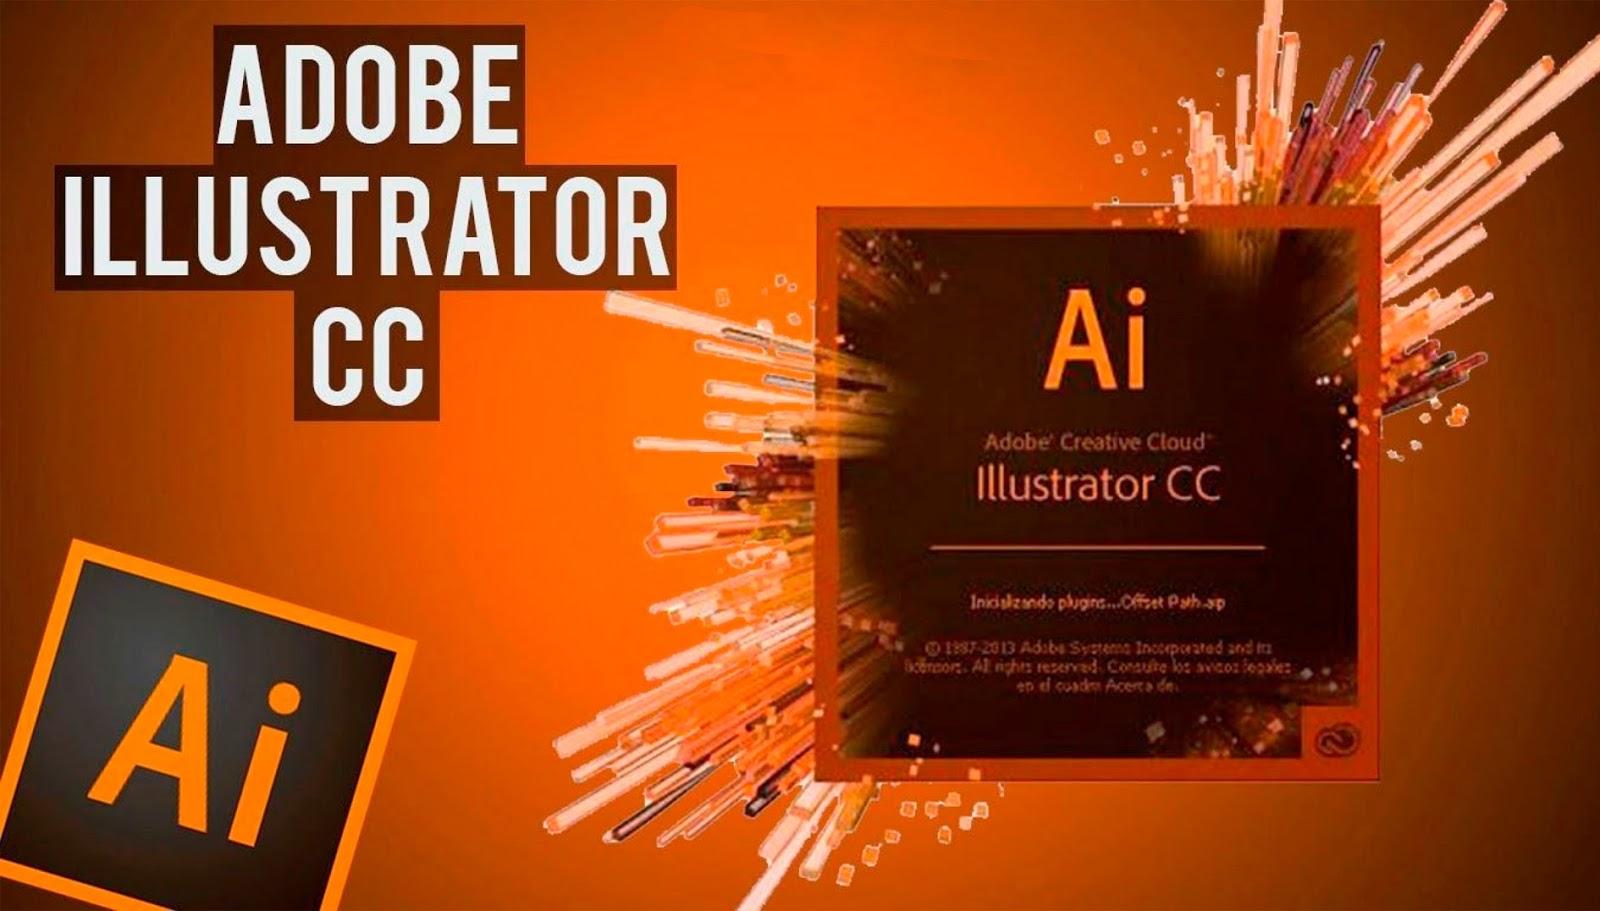 Adobe Illustrator CC 17 Pre Crack License Key Free